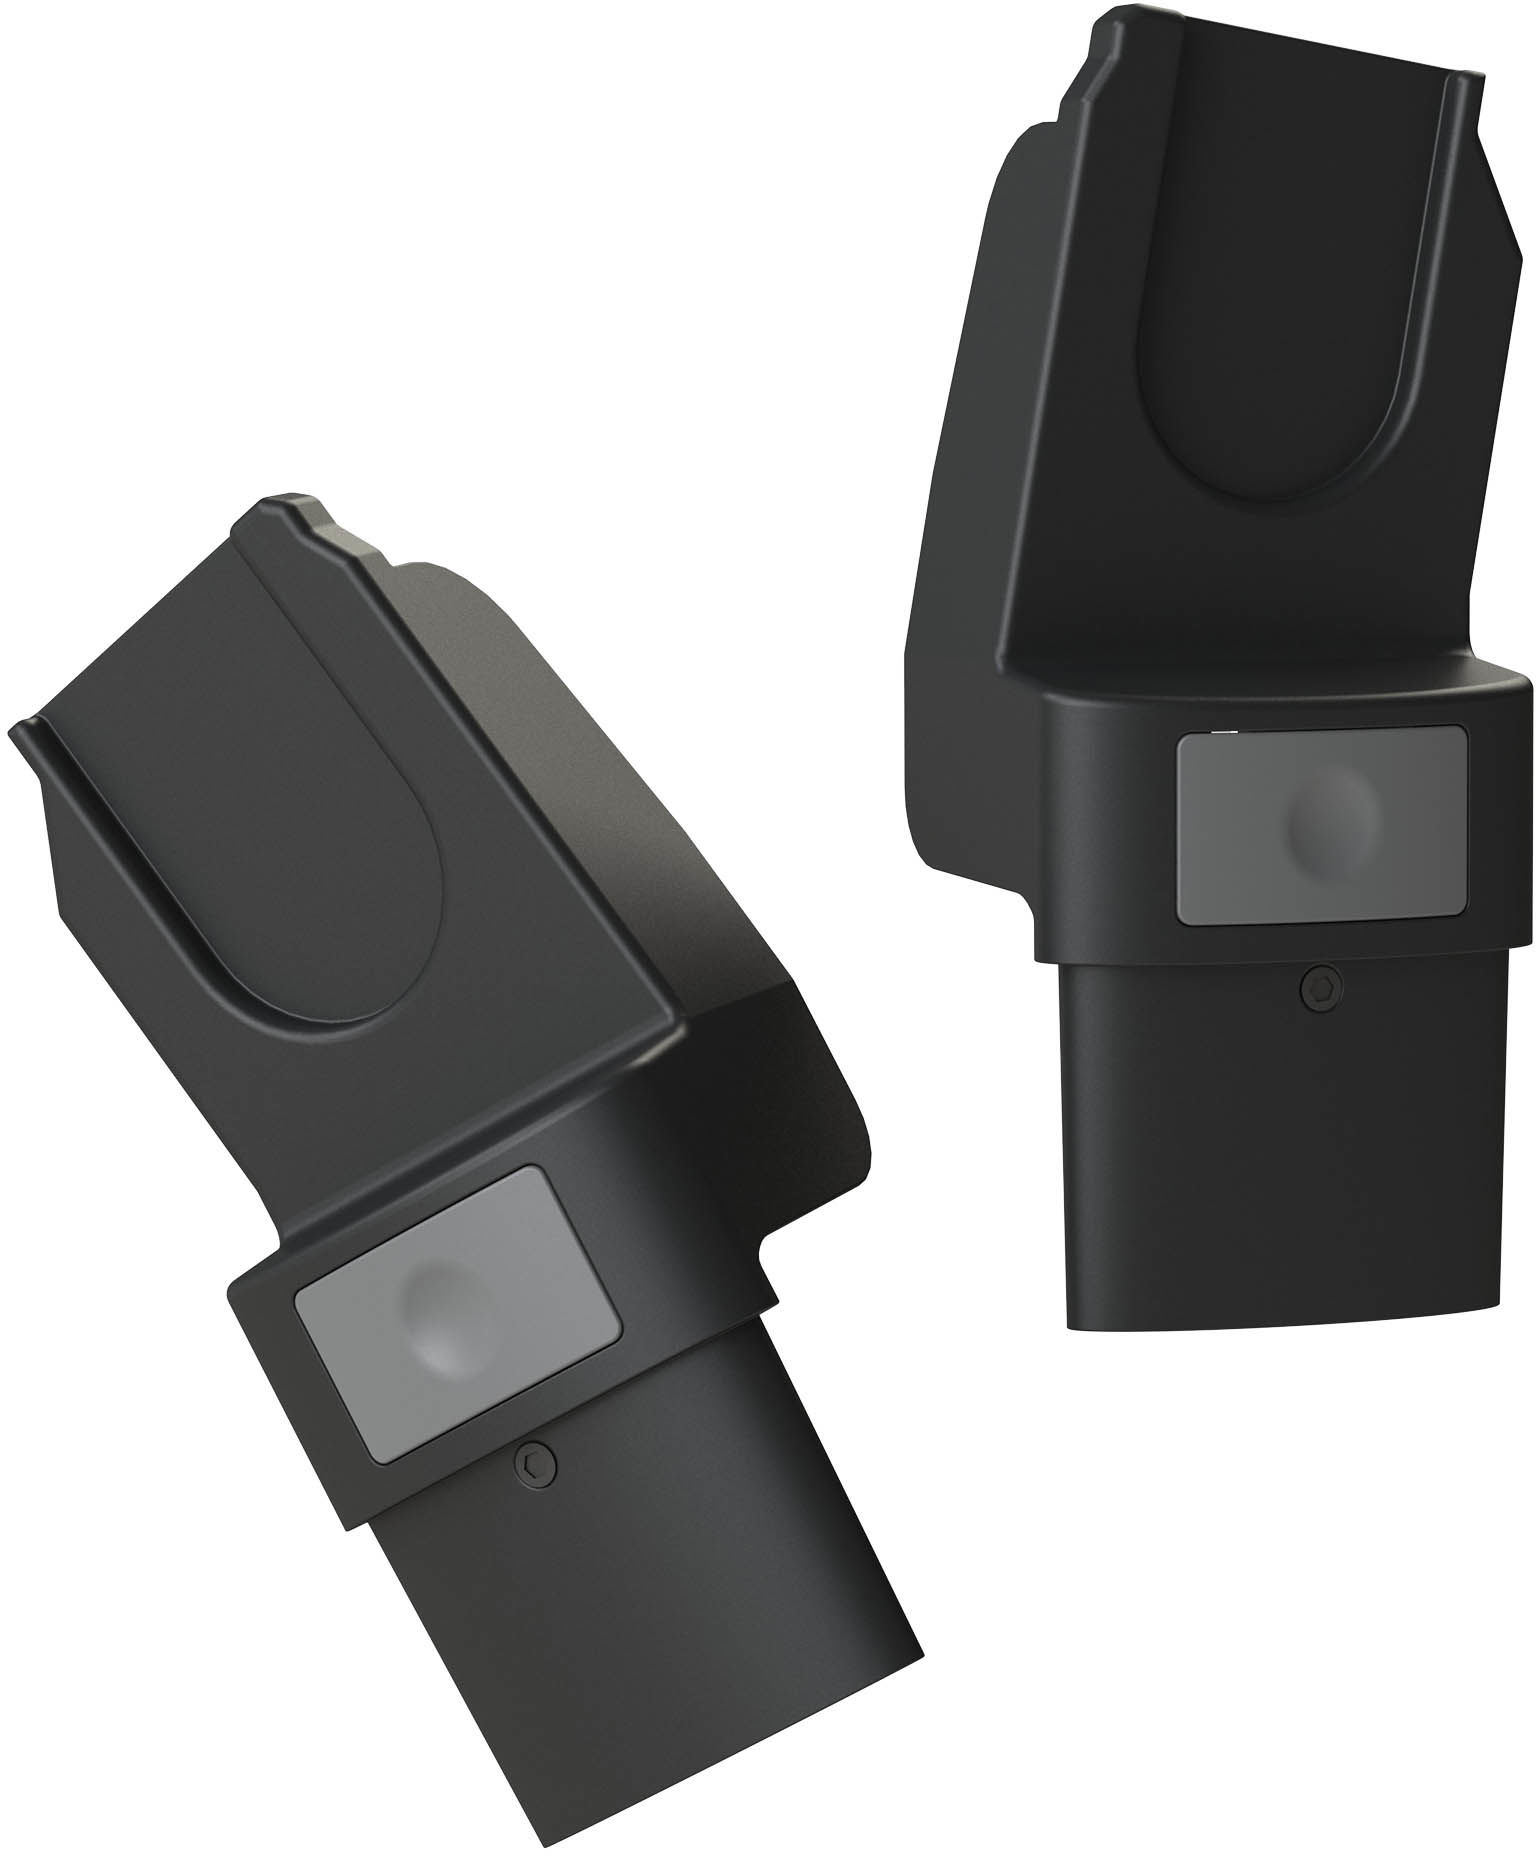 Joolz Day2, Joolz Day3 - adapter do fotelika Maxi Cosi